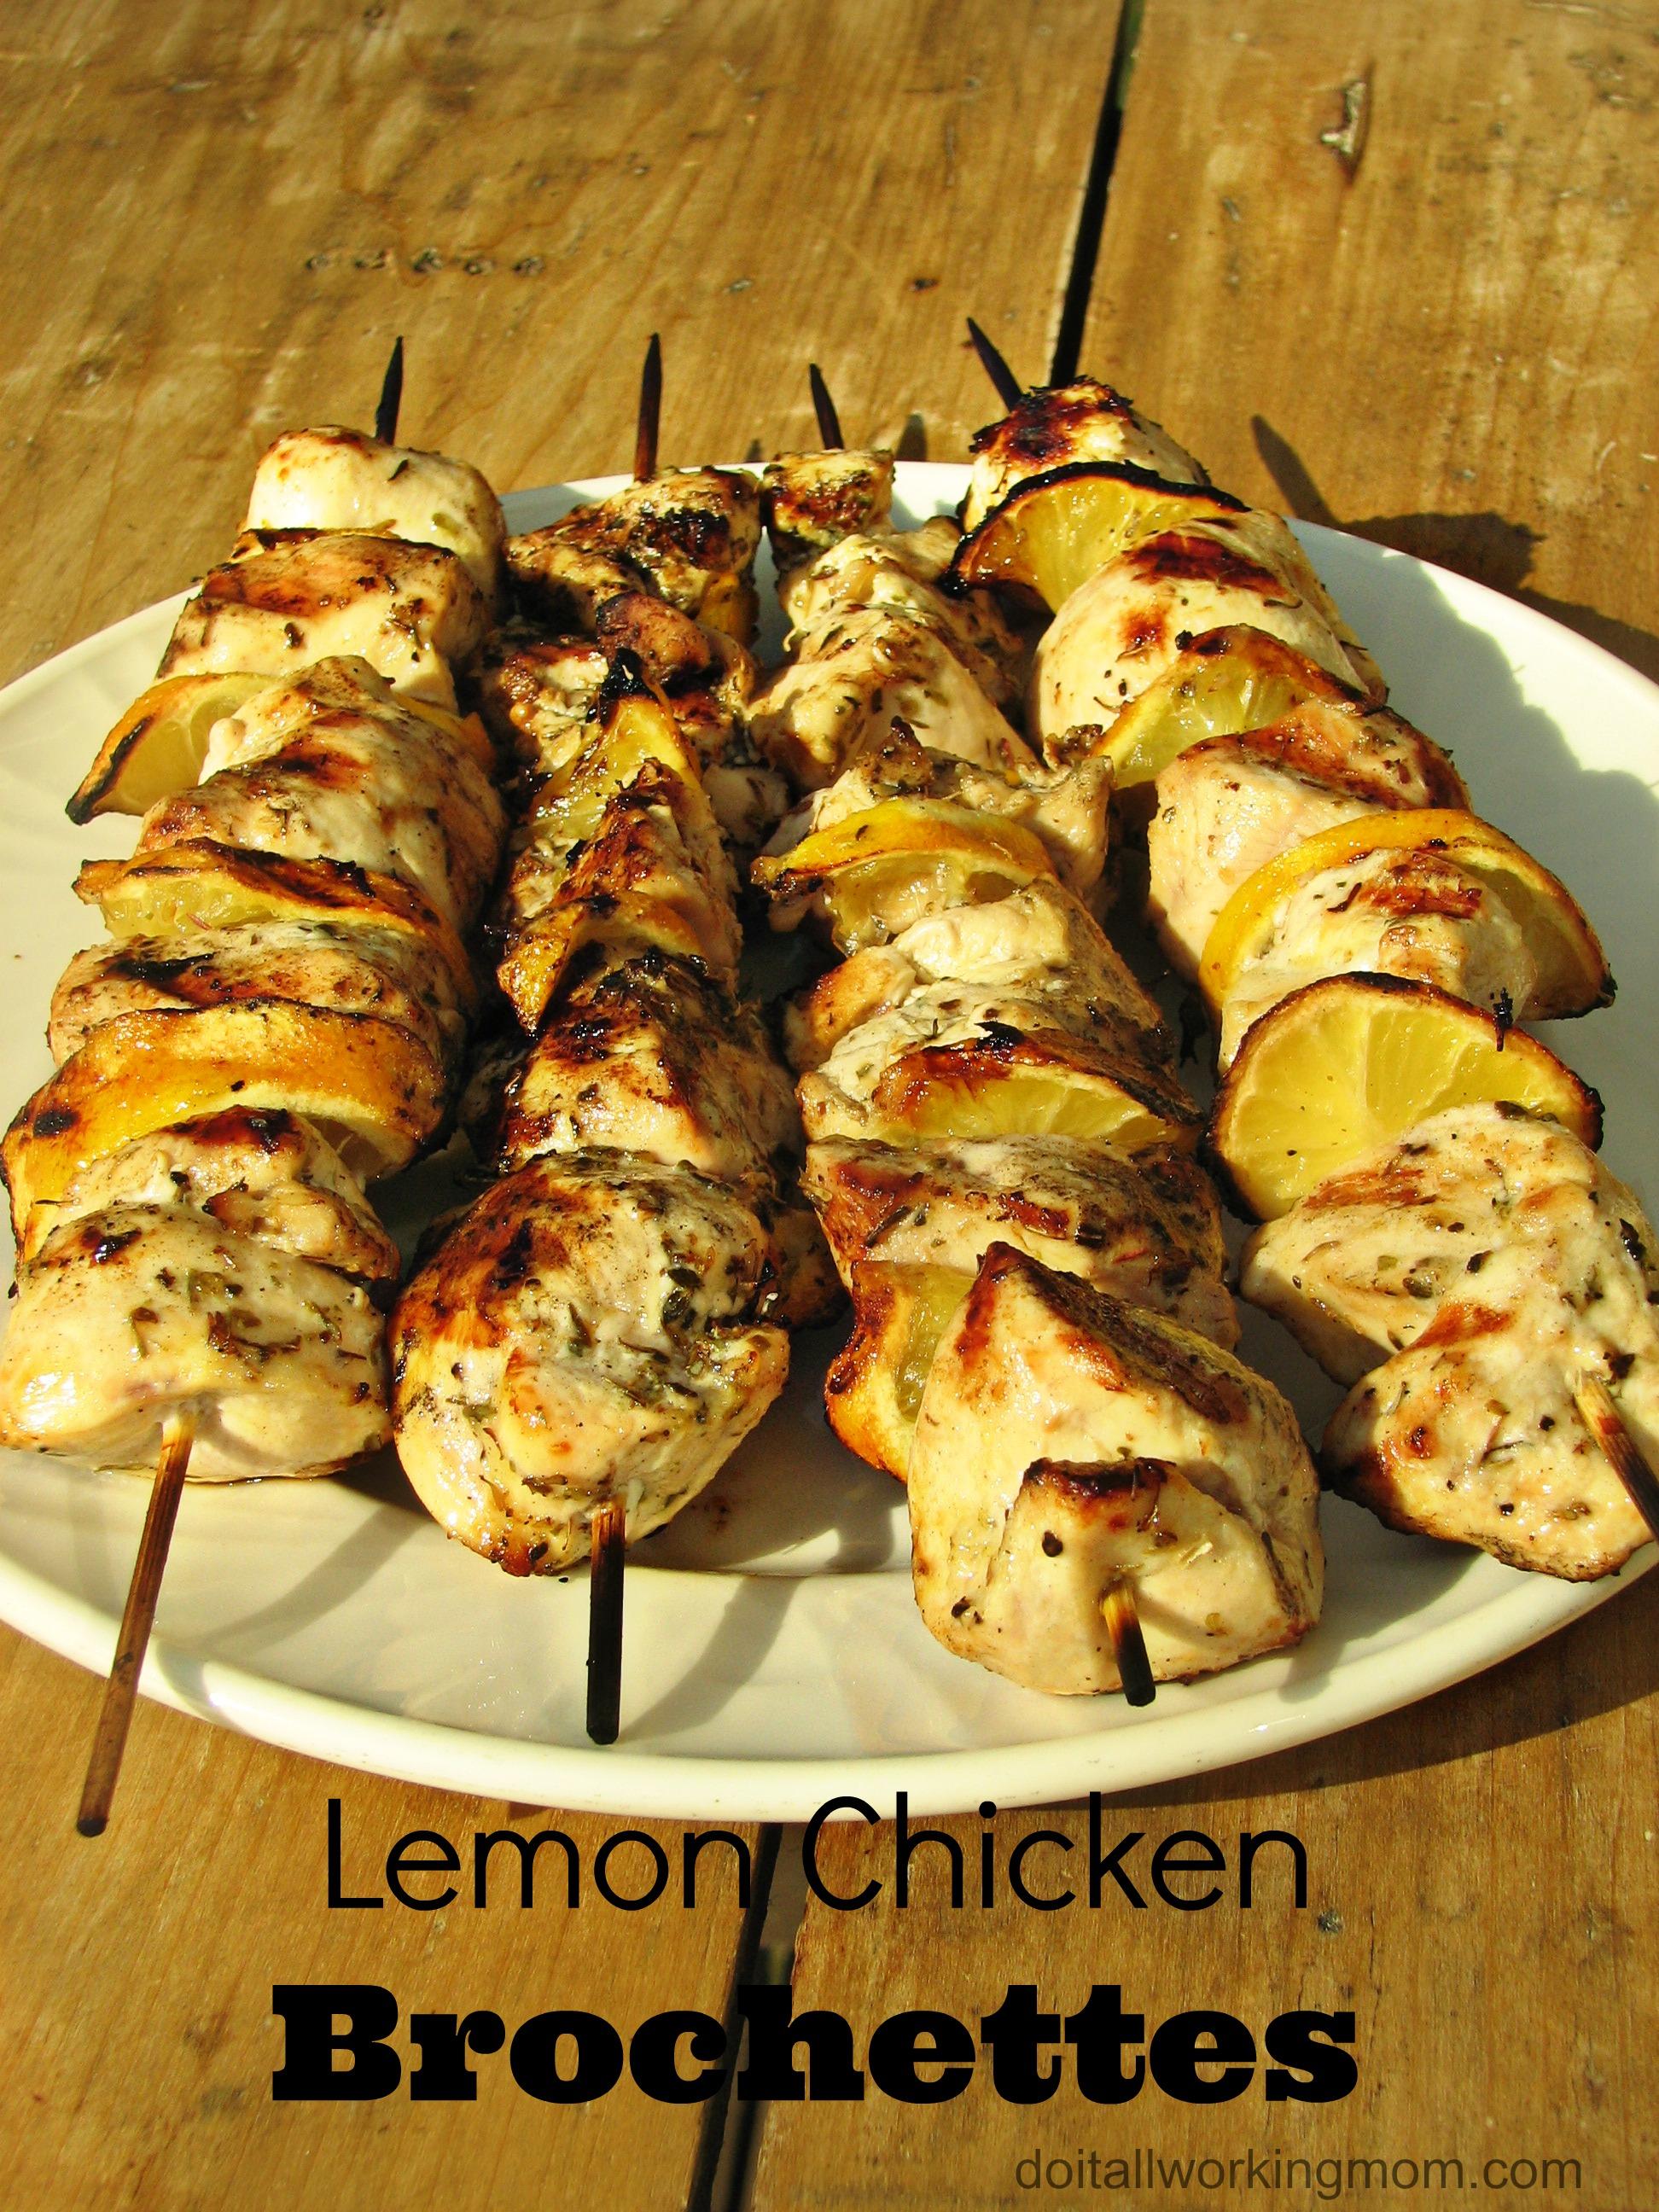 Lemon Chicken Brochettes